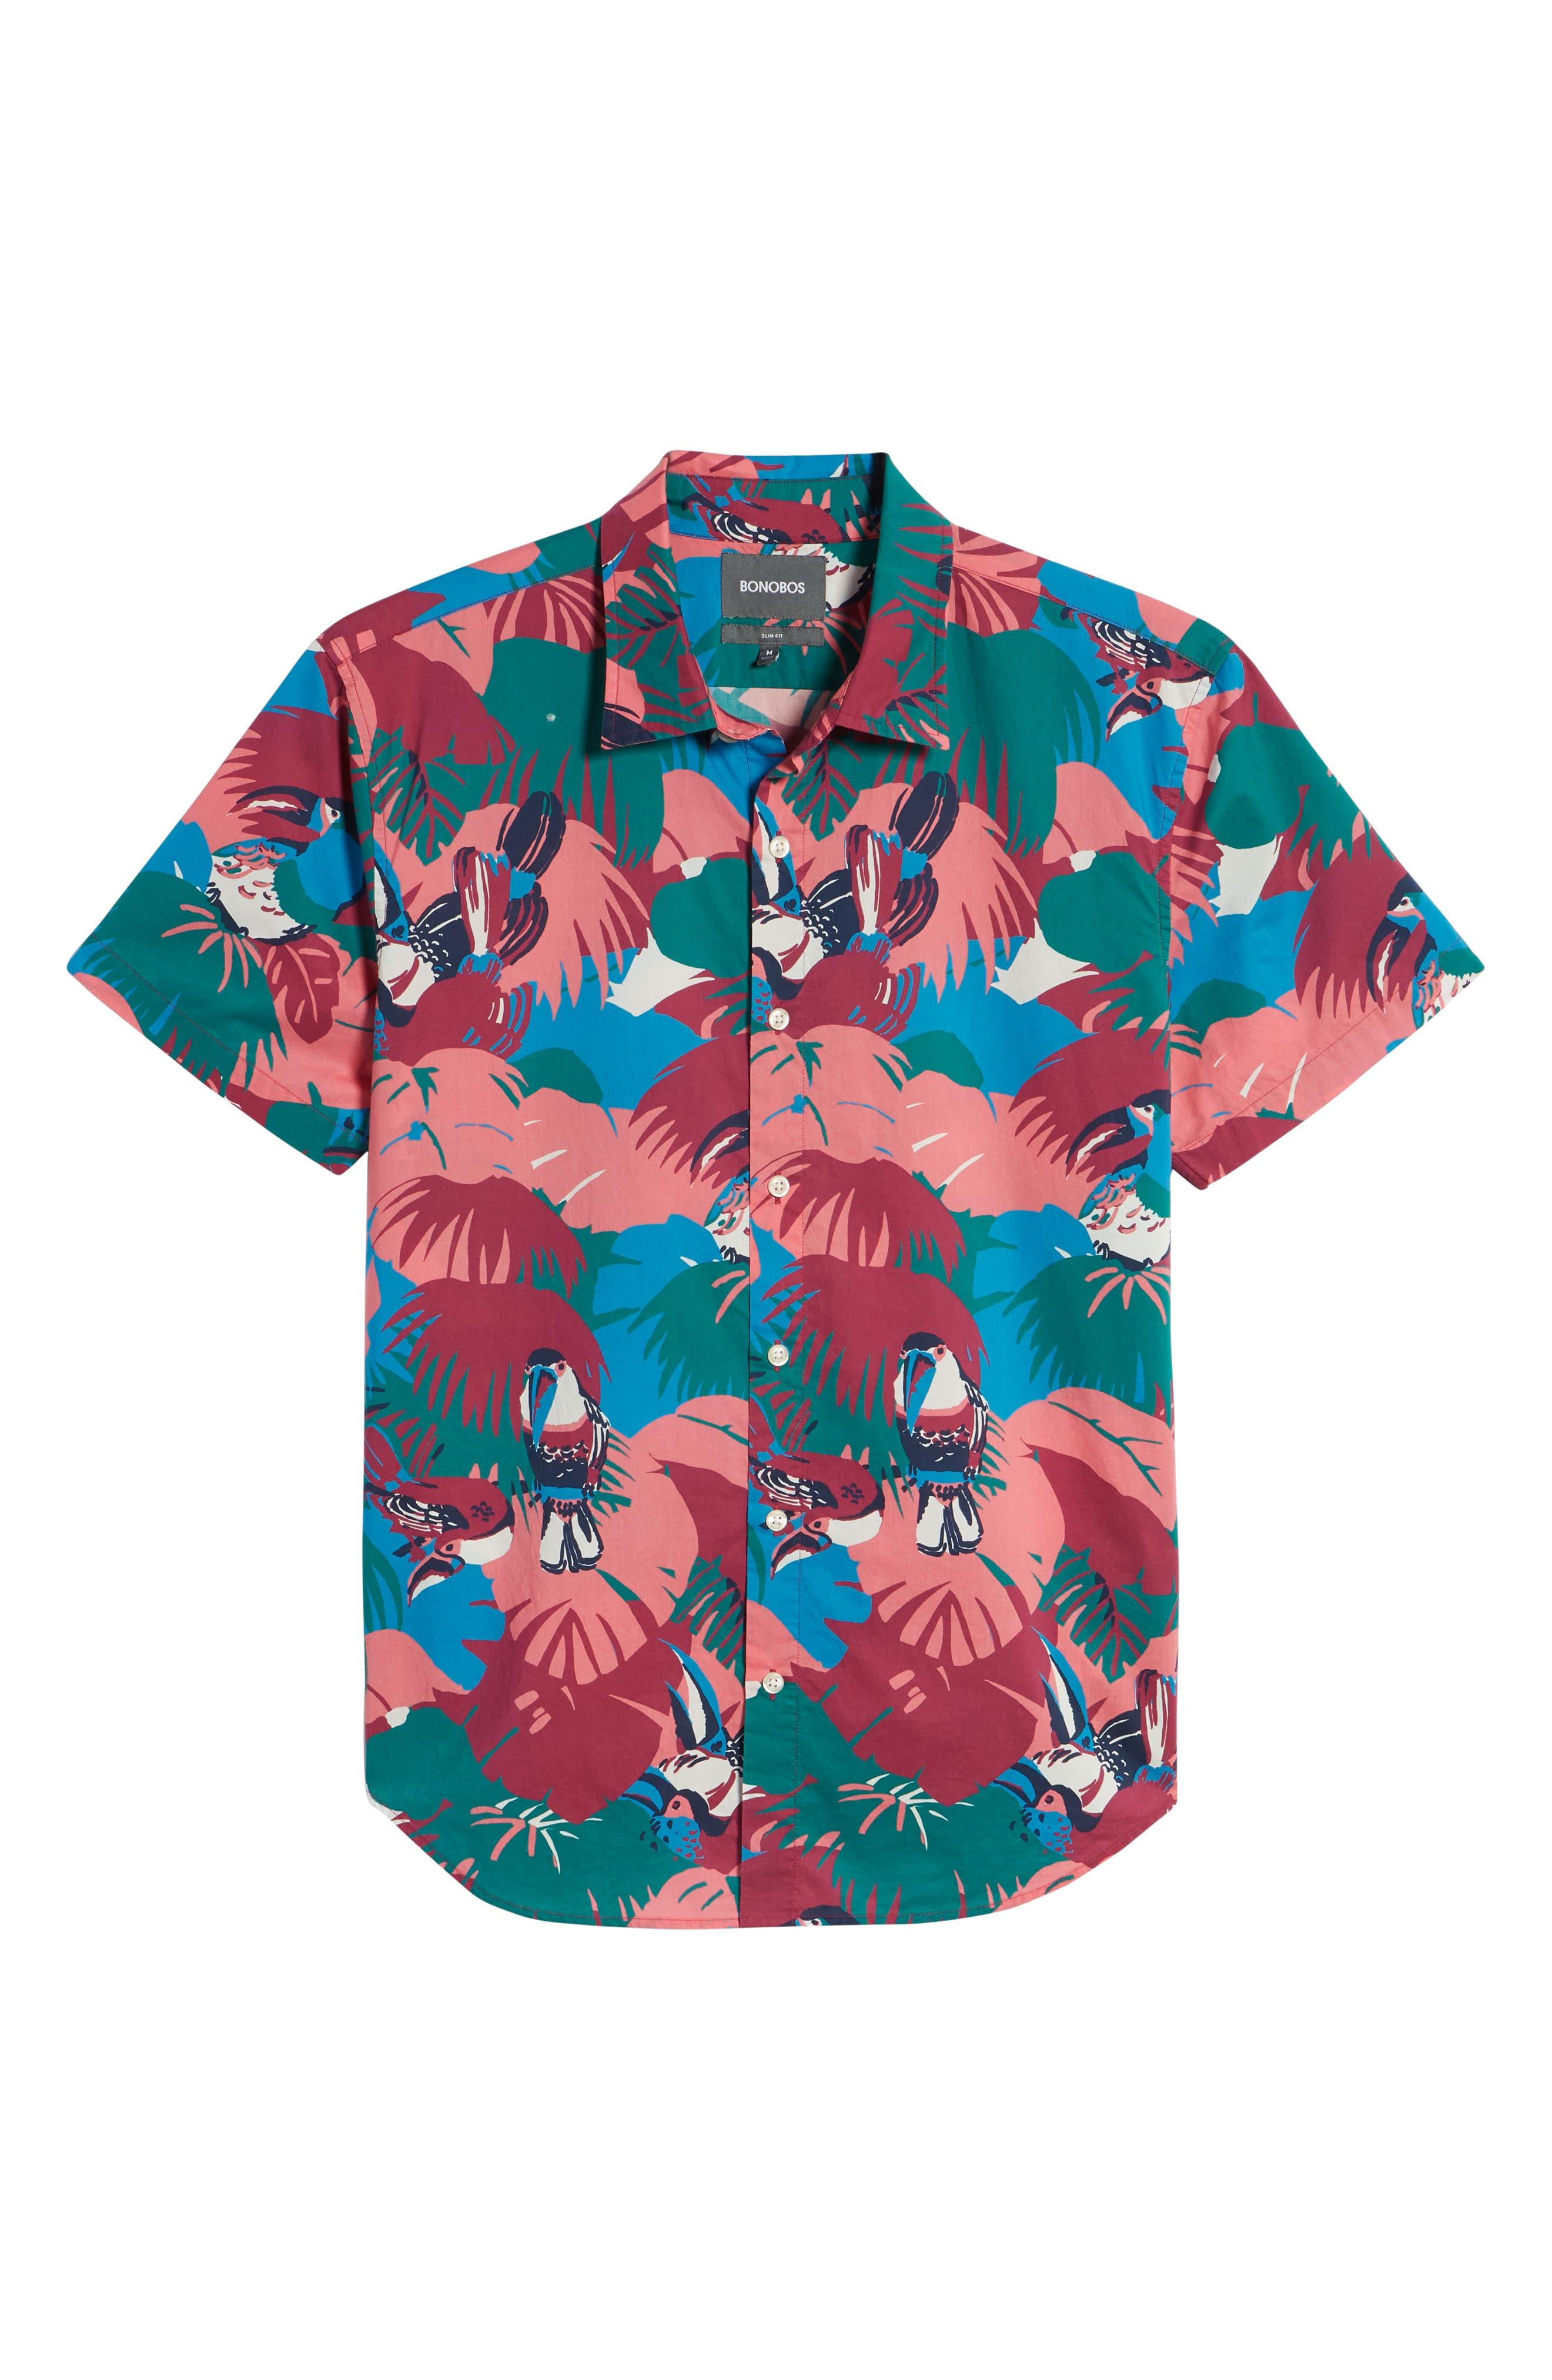 Riviera Slim Fit Toucan Print Sport Shirt,                             Alternate thumbnail 6, color,                             Toucan Tropics - Peony Coral